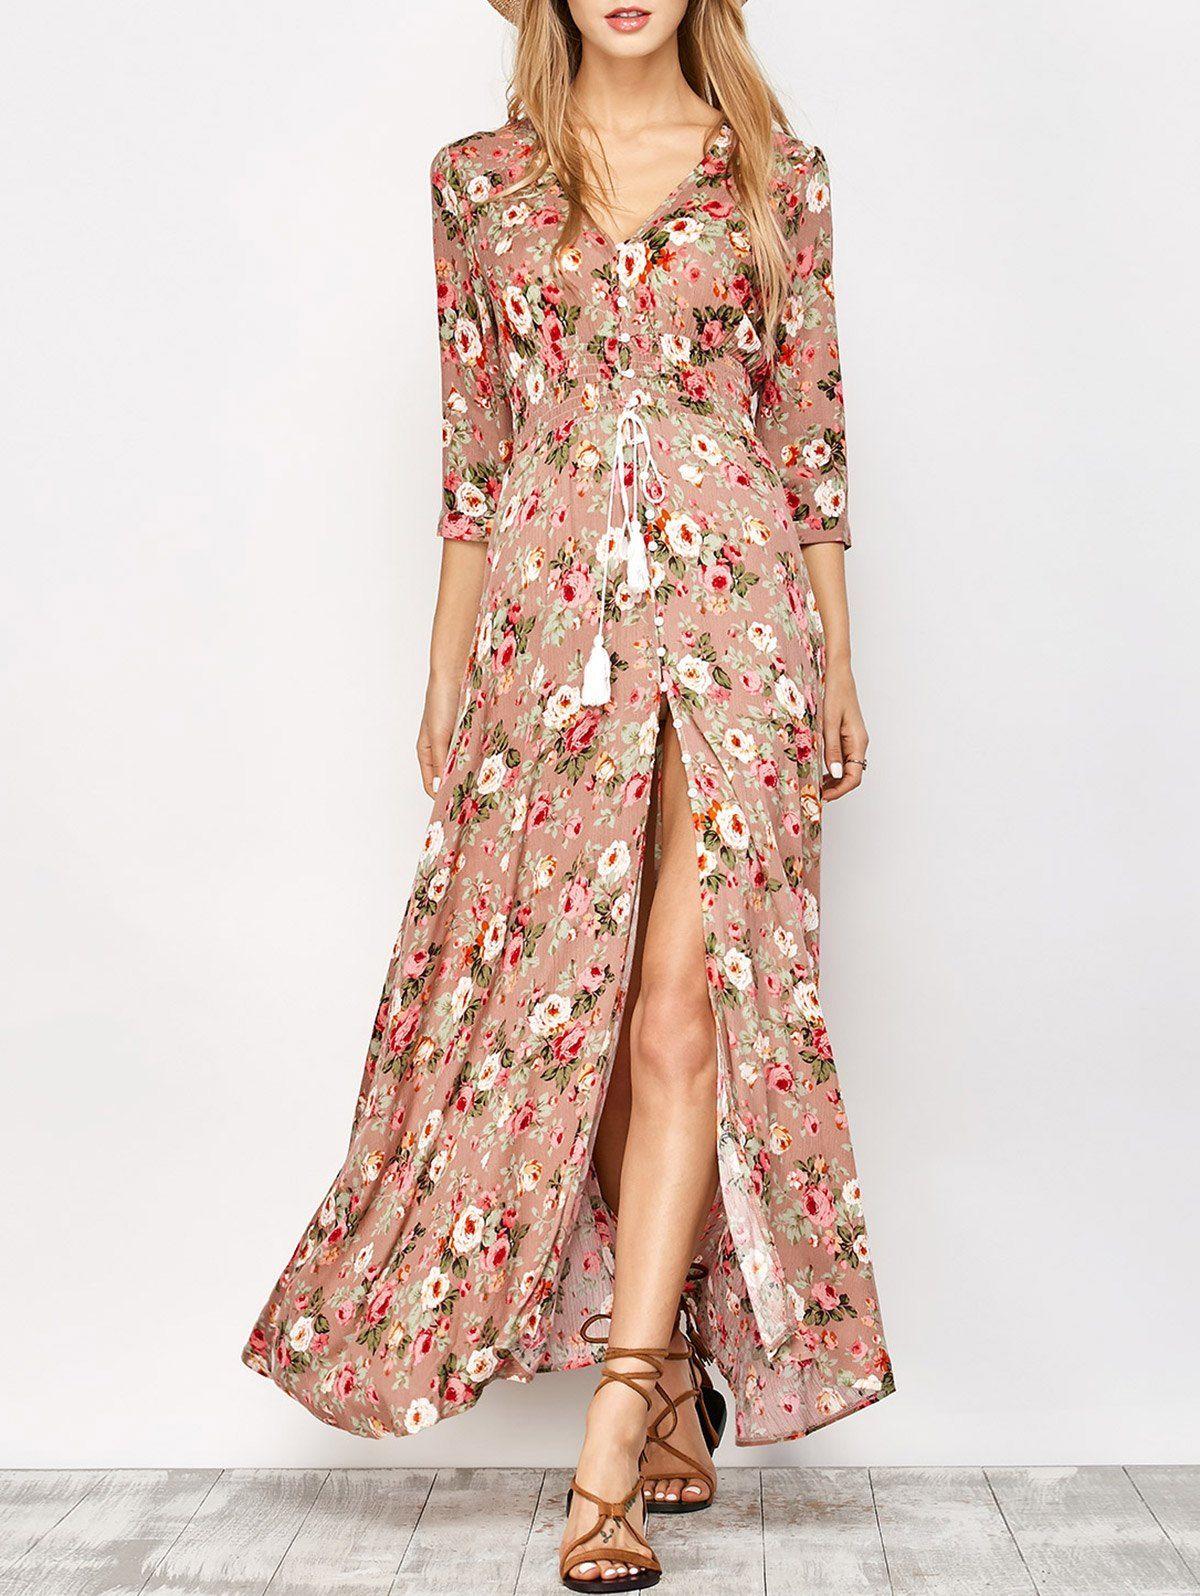 Button Front Floral Casual Summer Maxi Dress, FLORAL, L in Maxi Dresses |  DressLily